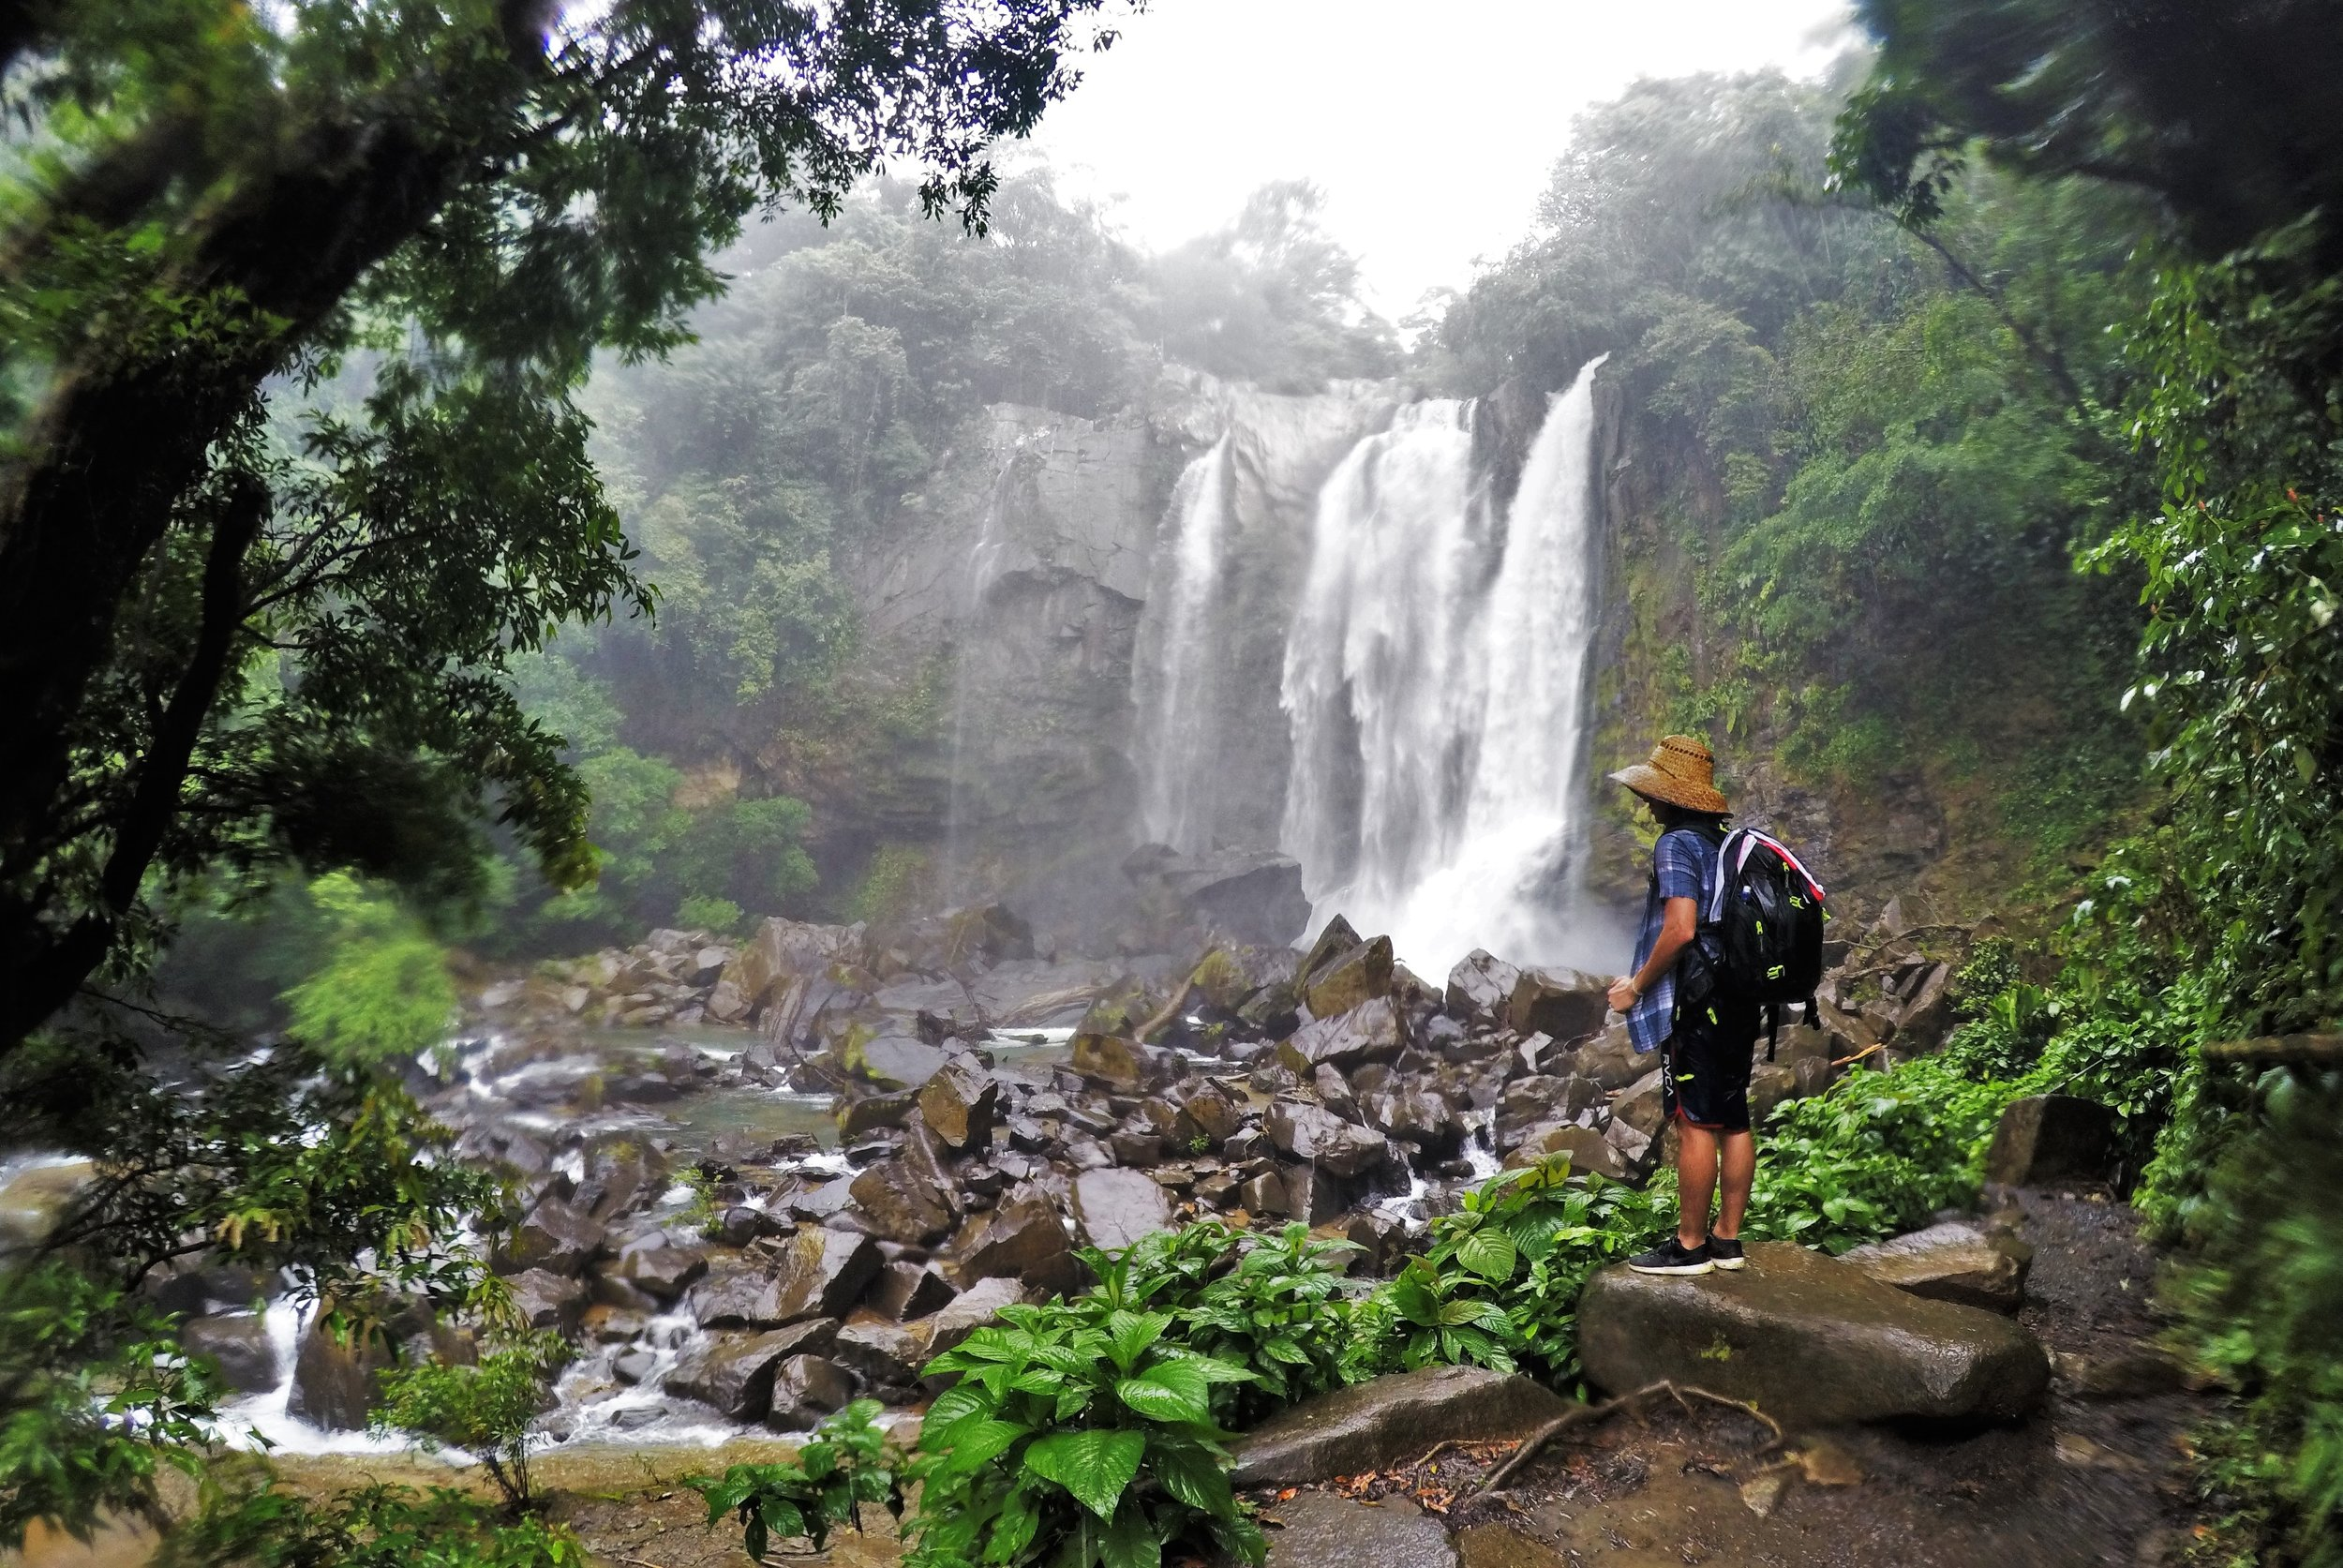 Nauyaca Waterfalls - Pérez Zeledón